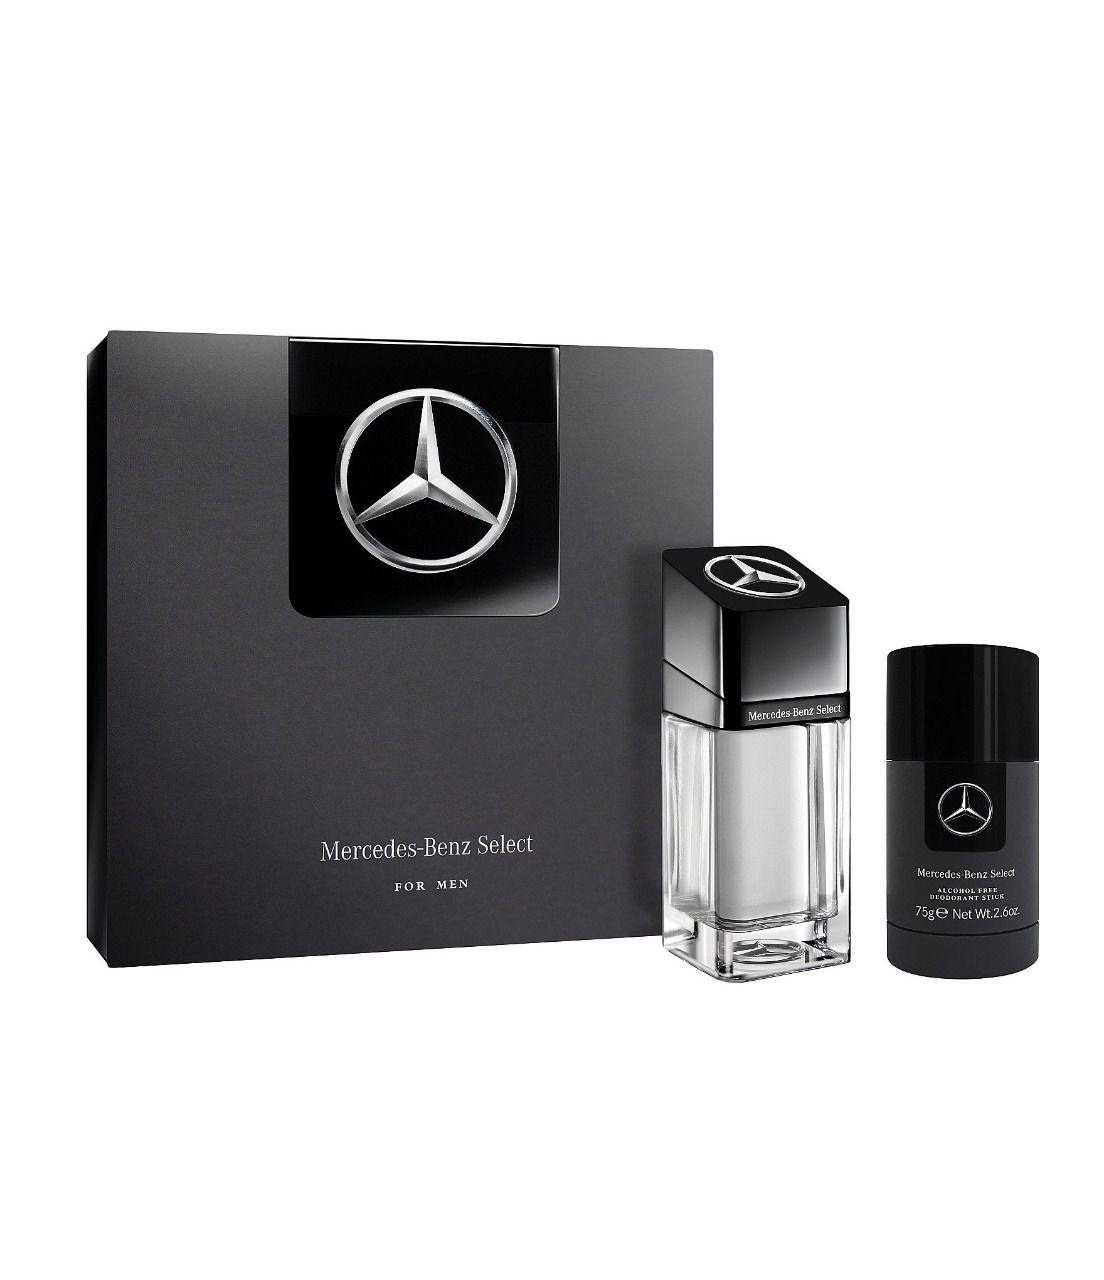 Kit Mercedes Benz Select Masculino Eau de Toilette 100ml + Desodorante 75g